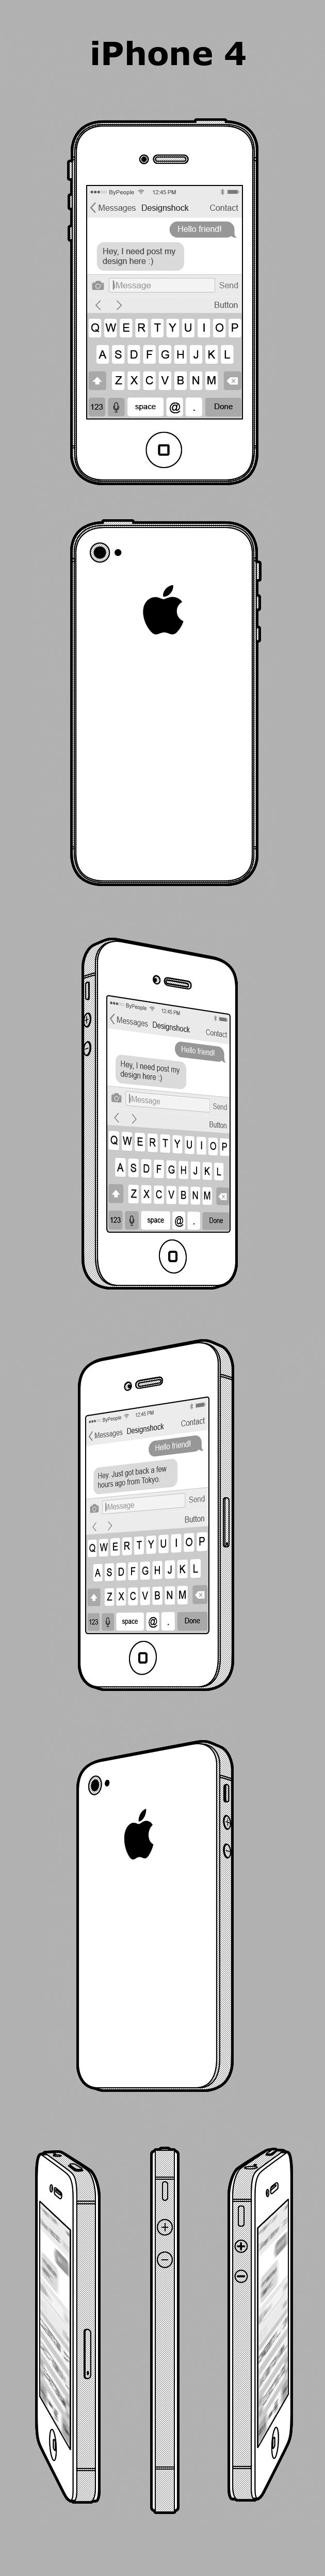 line_iphone_mockup_01